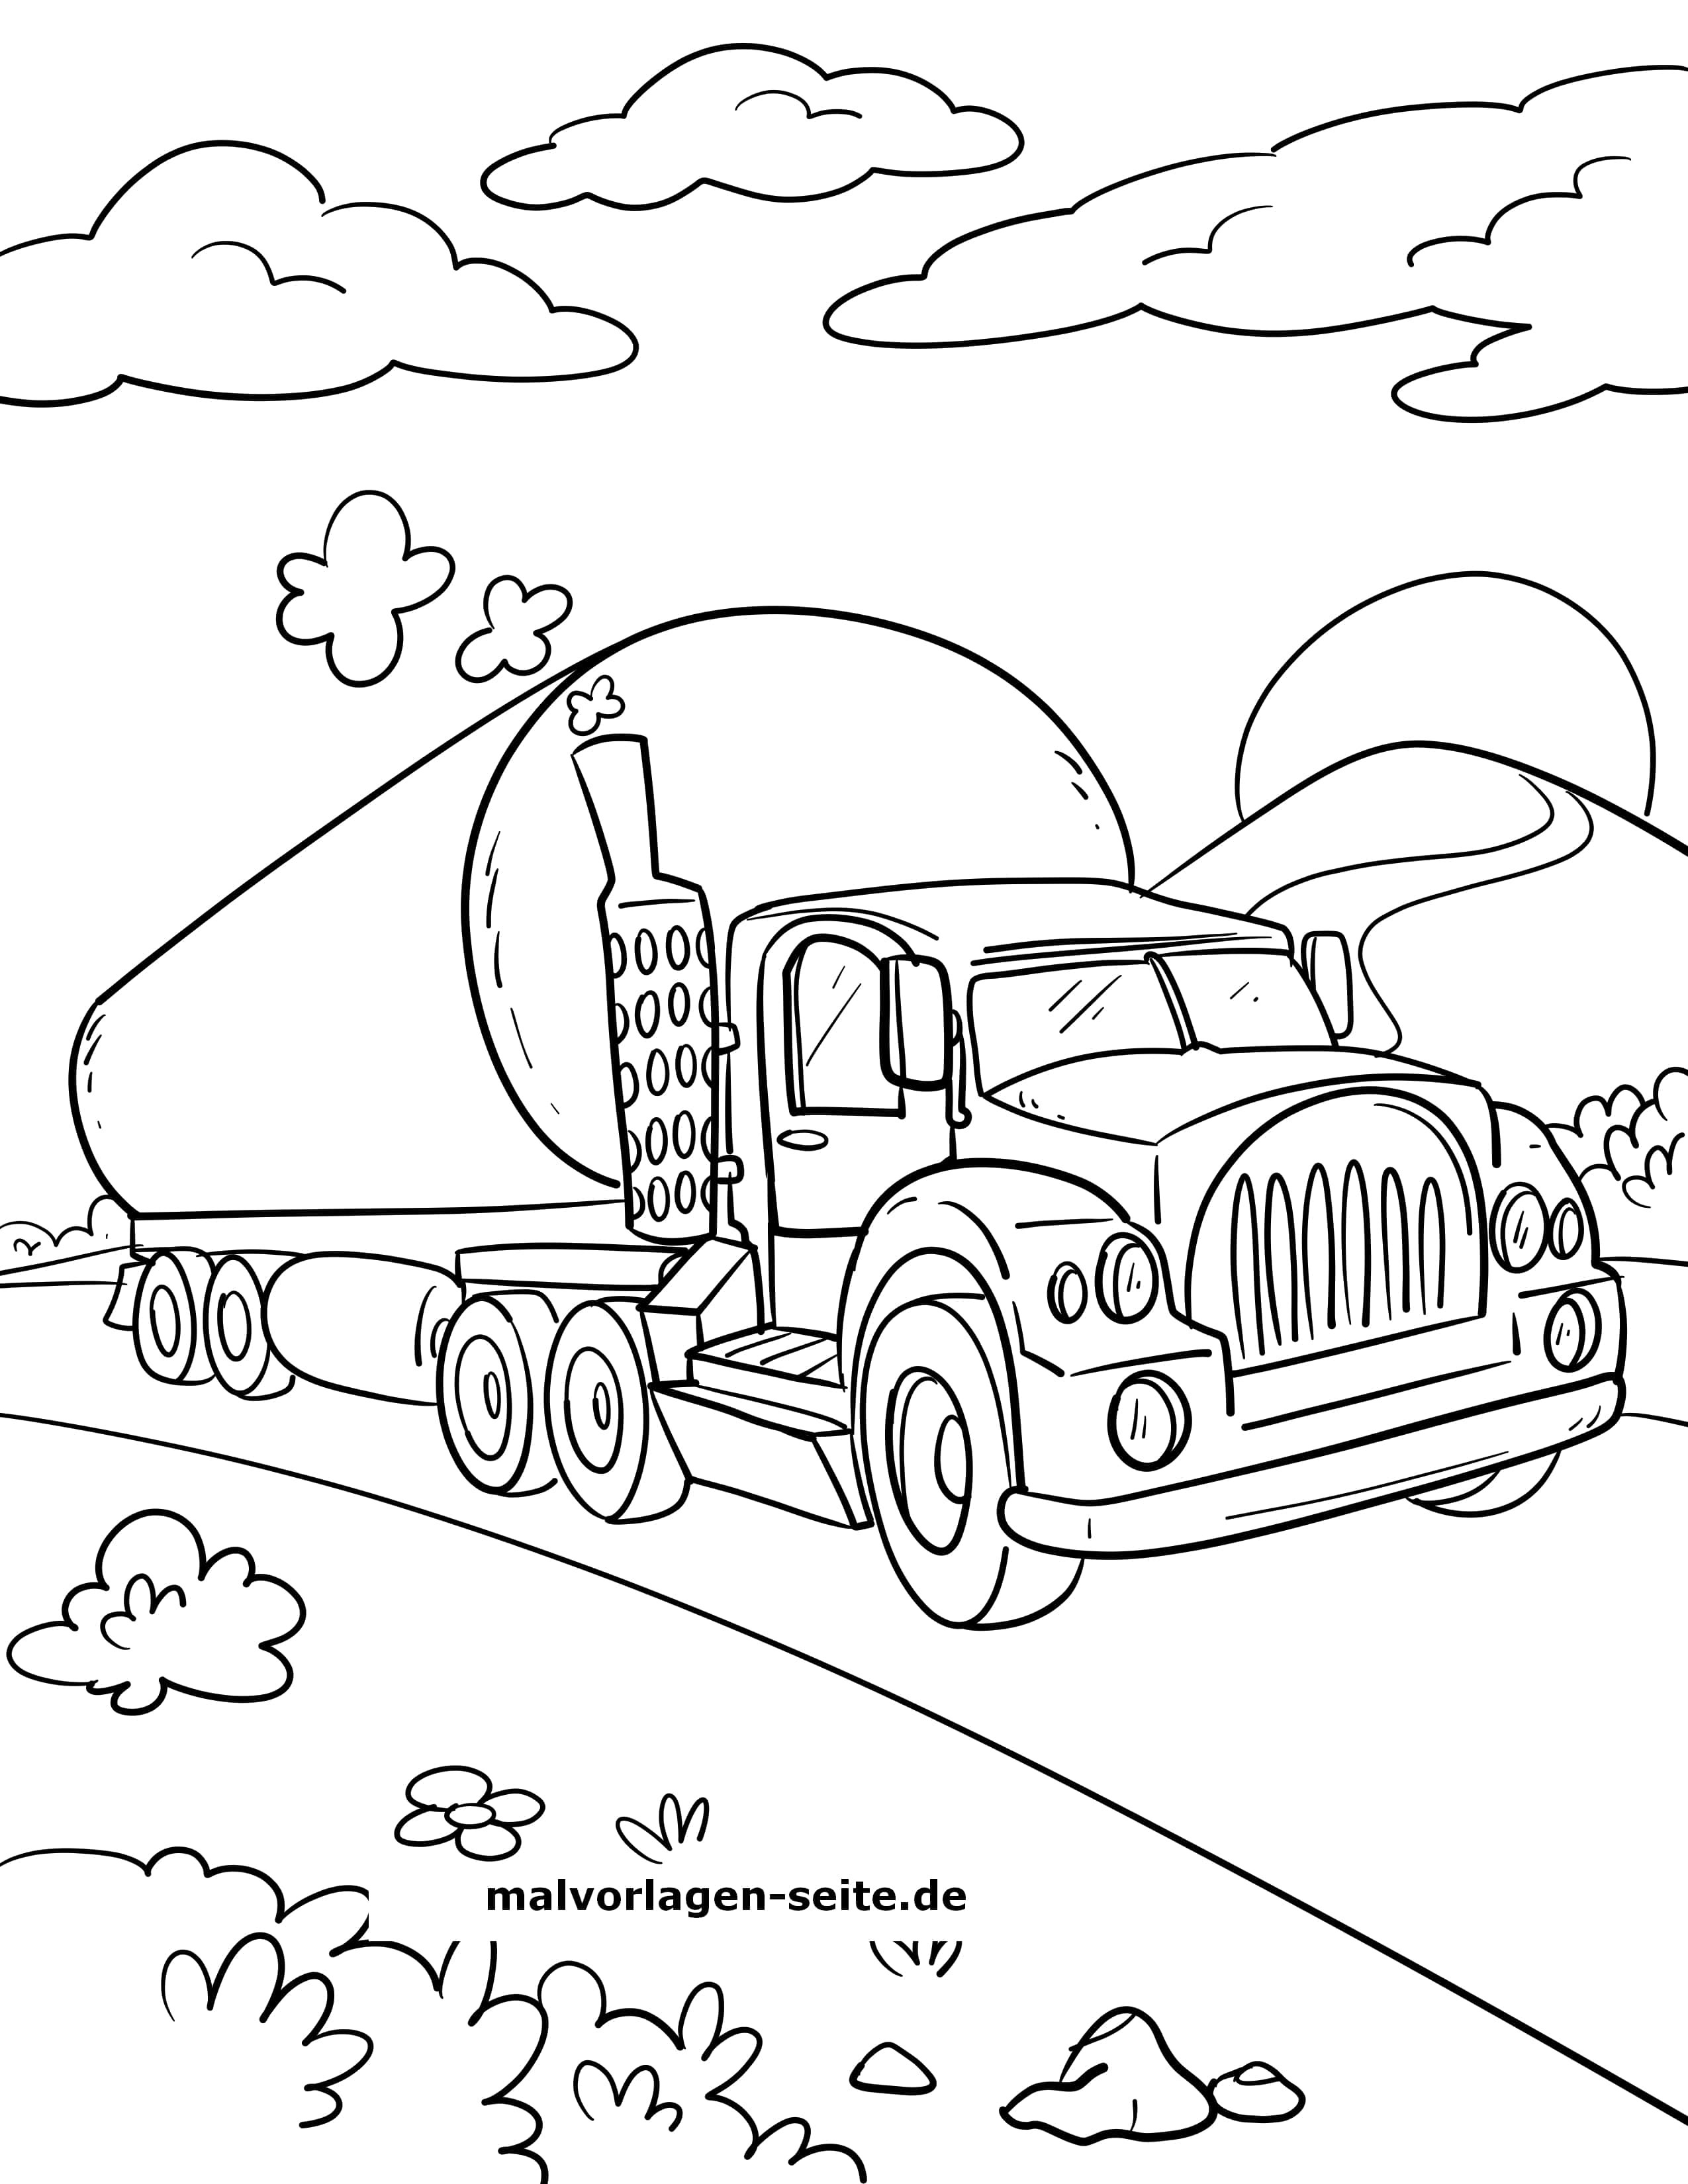 malvorlage tanklaster / tankwagen | laster - kostenlose